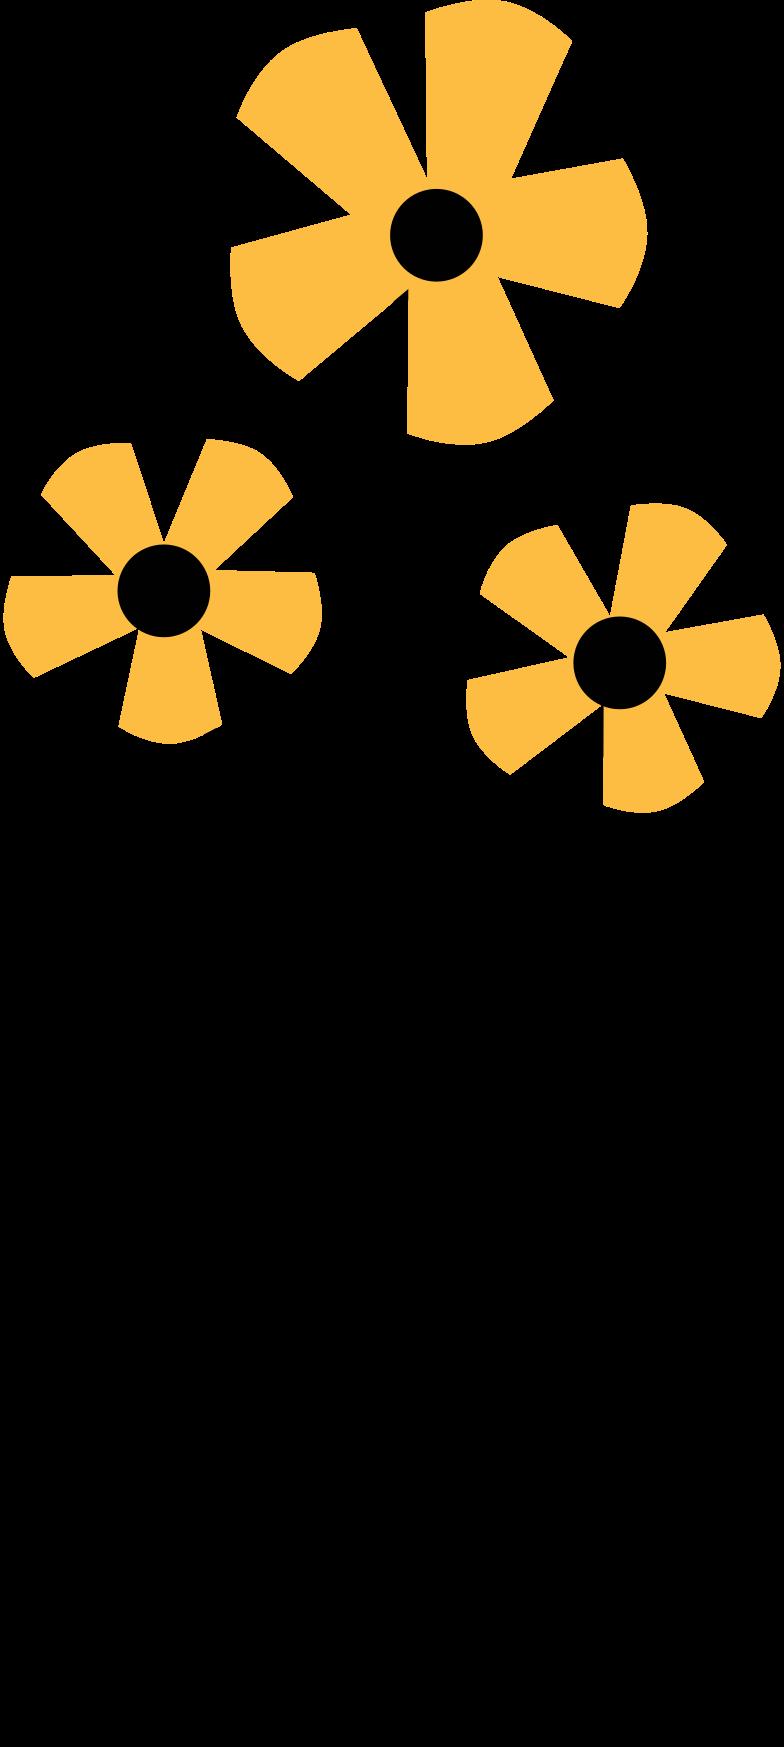 Illustration clipart flower aux formats PNG, SVG